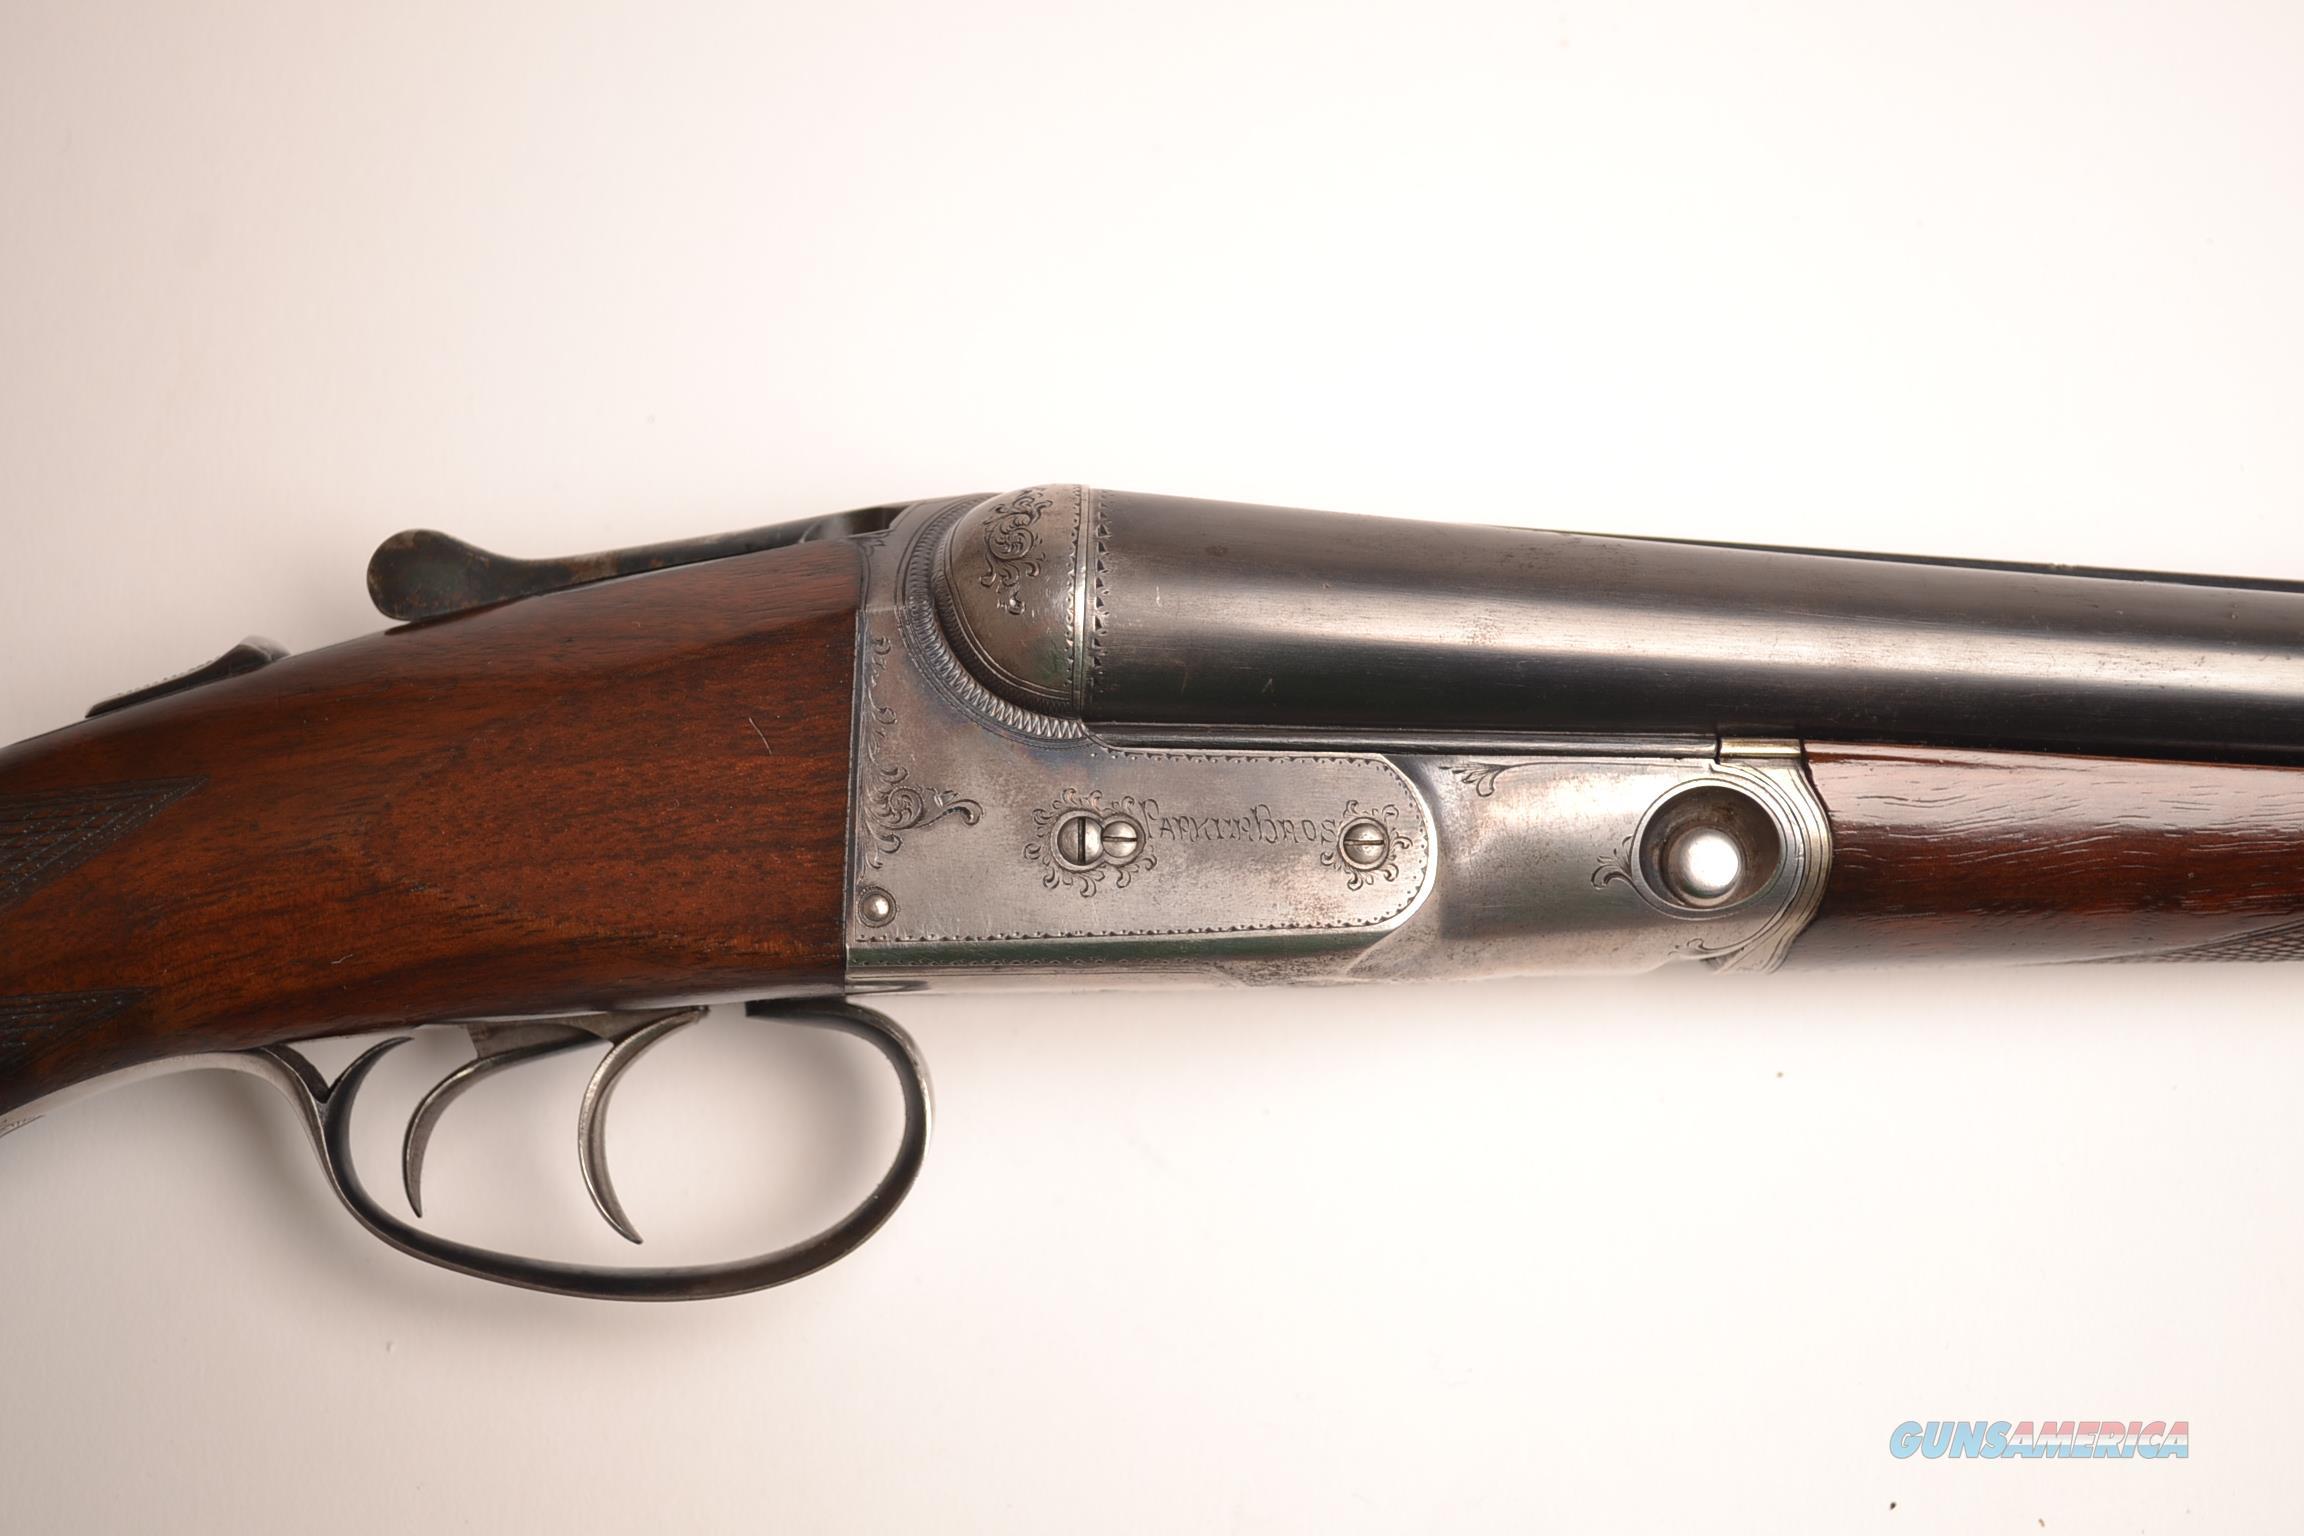 Parker - PHE, 16ga.  Guns > Shotguns > Parker Shotguns